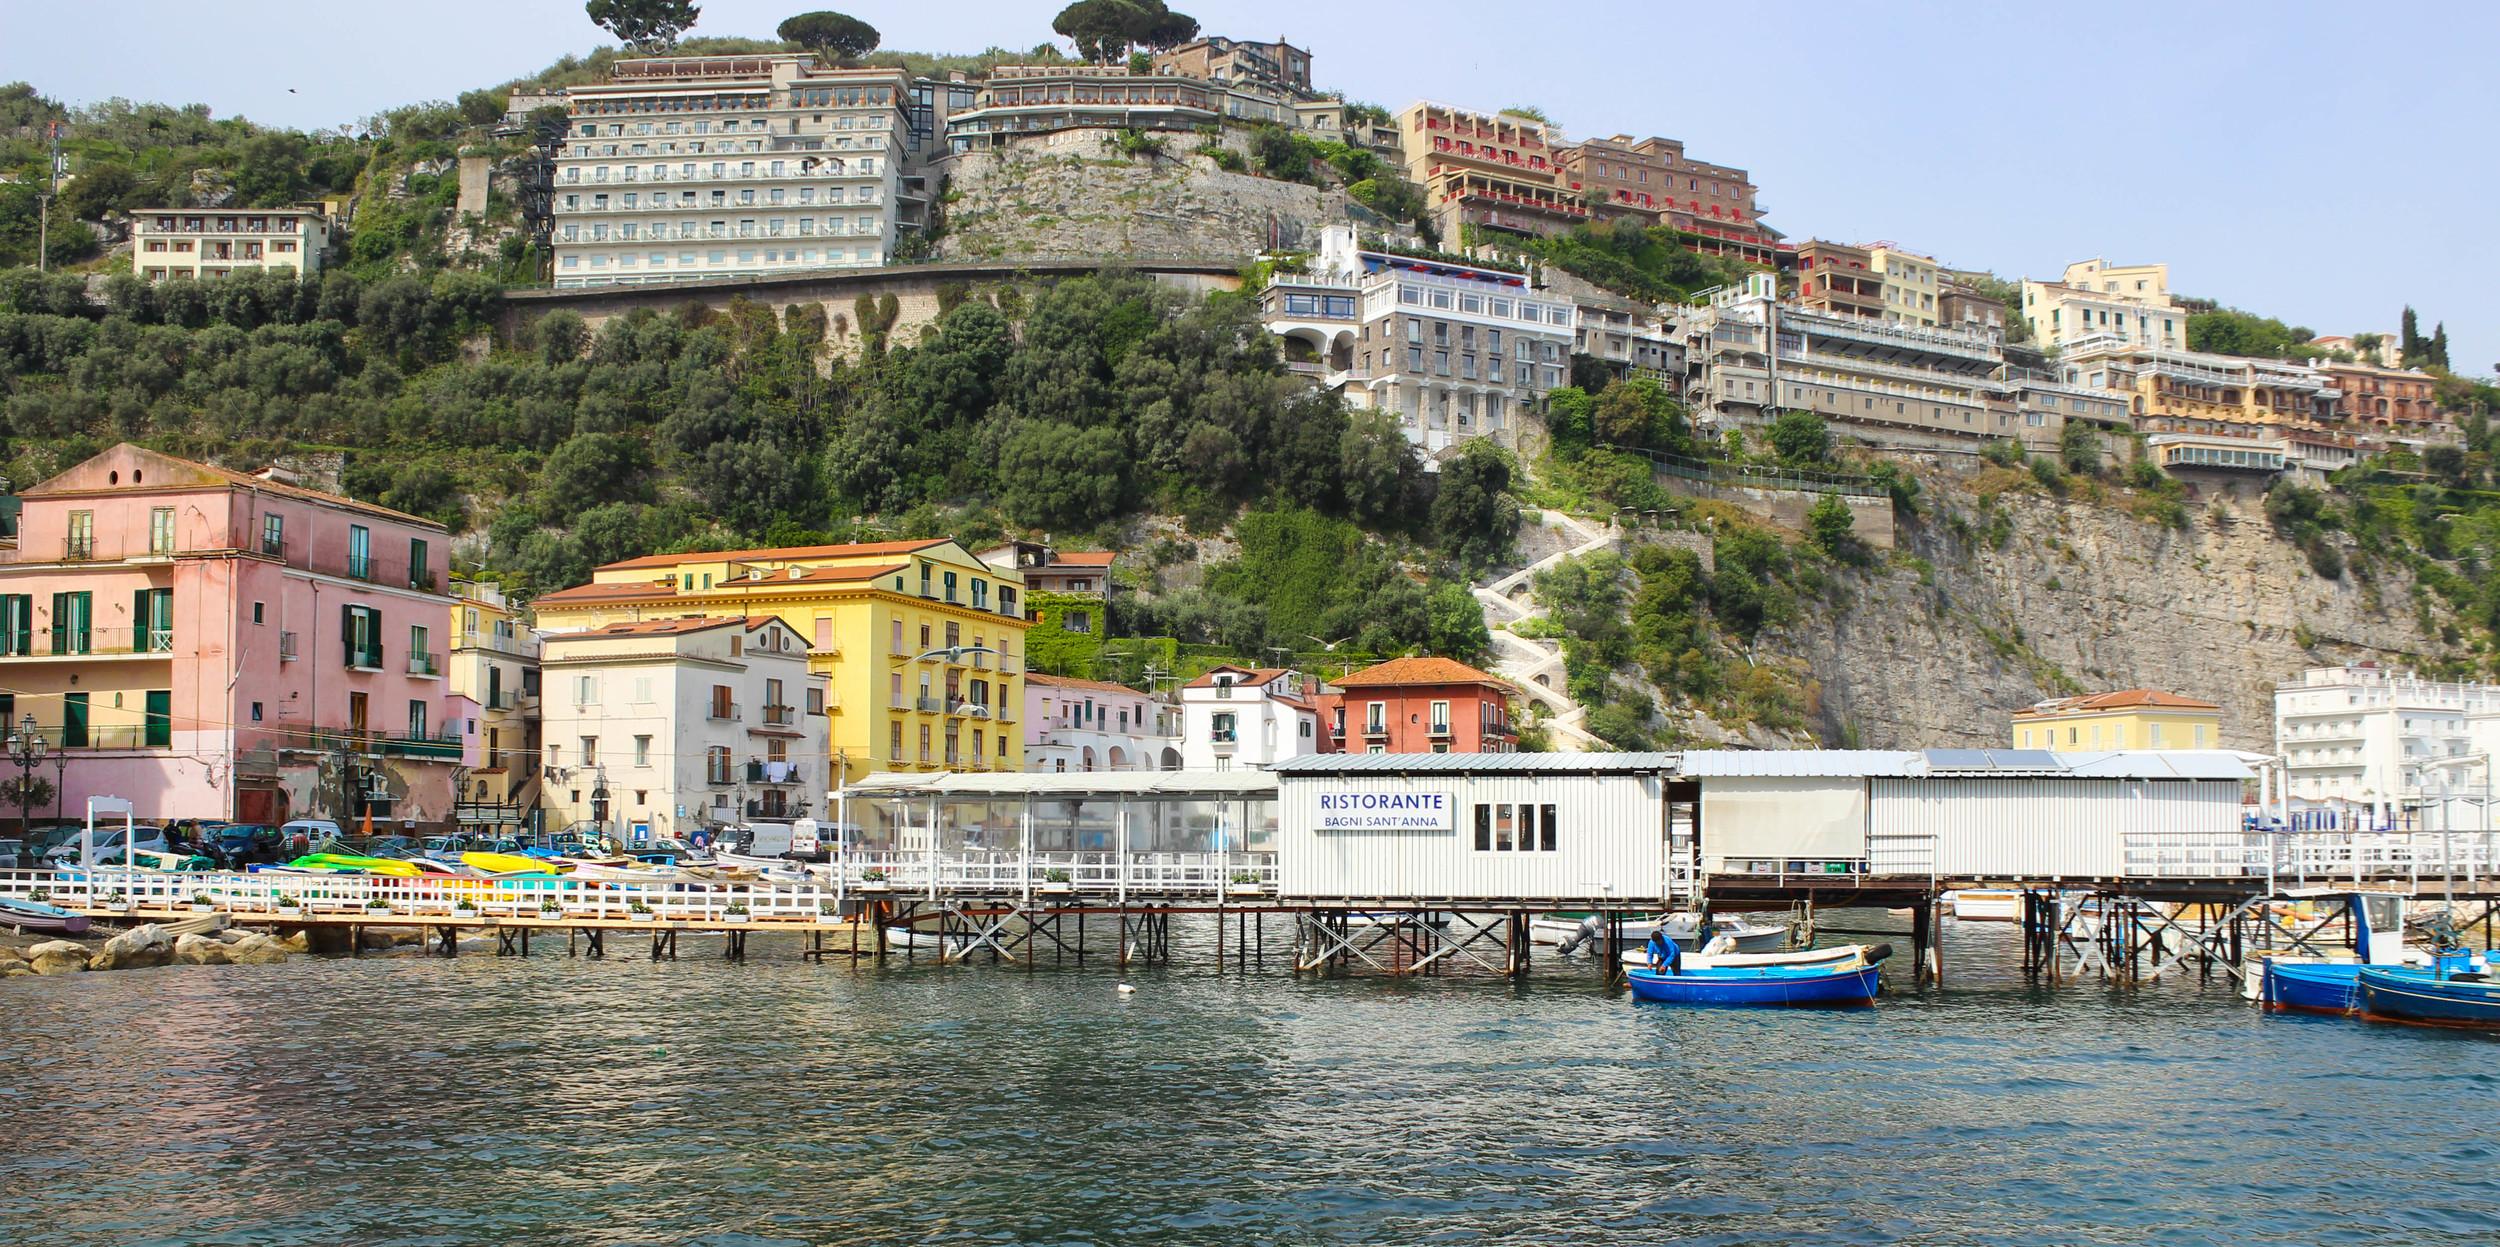 LUXURY YACHT EXPERIENCE IN CAPRI, ITALY